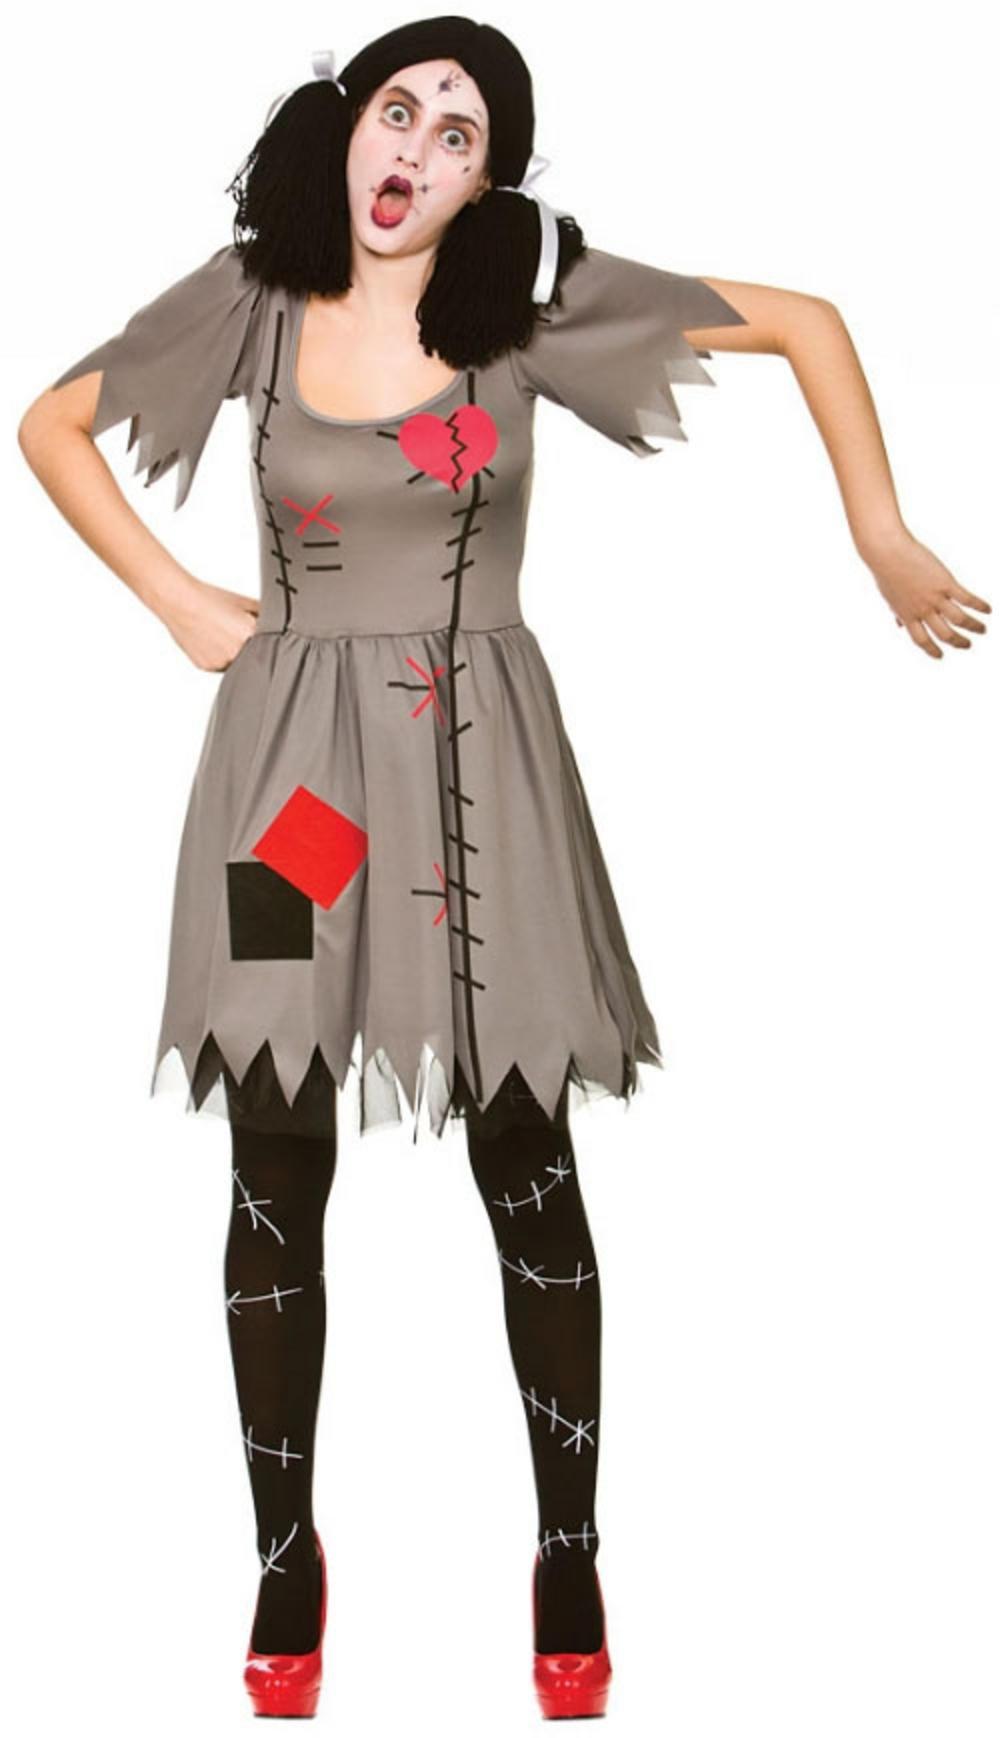 black voodoo doll costume - photo #21